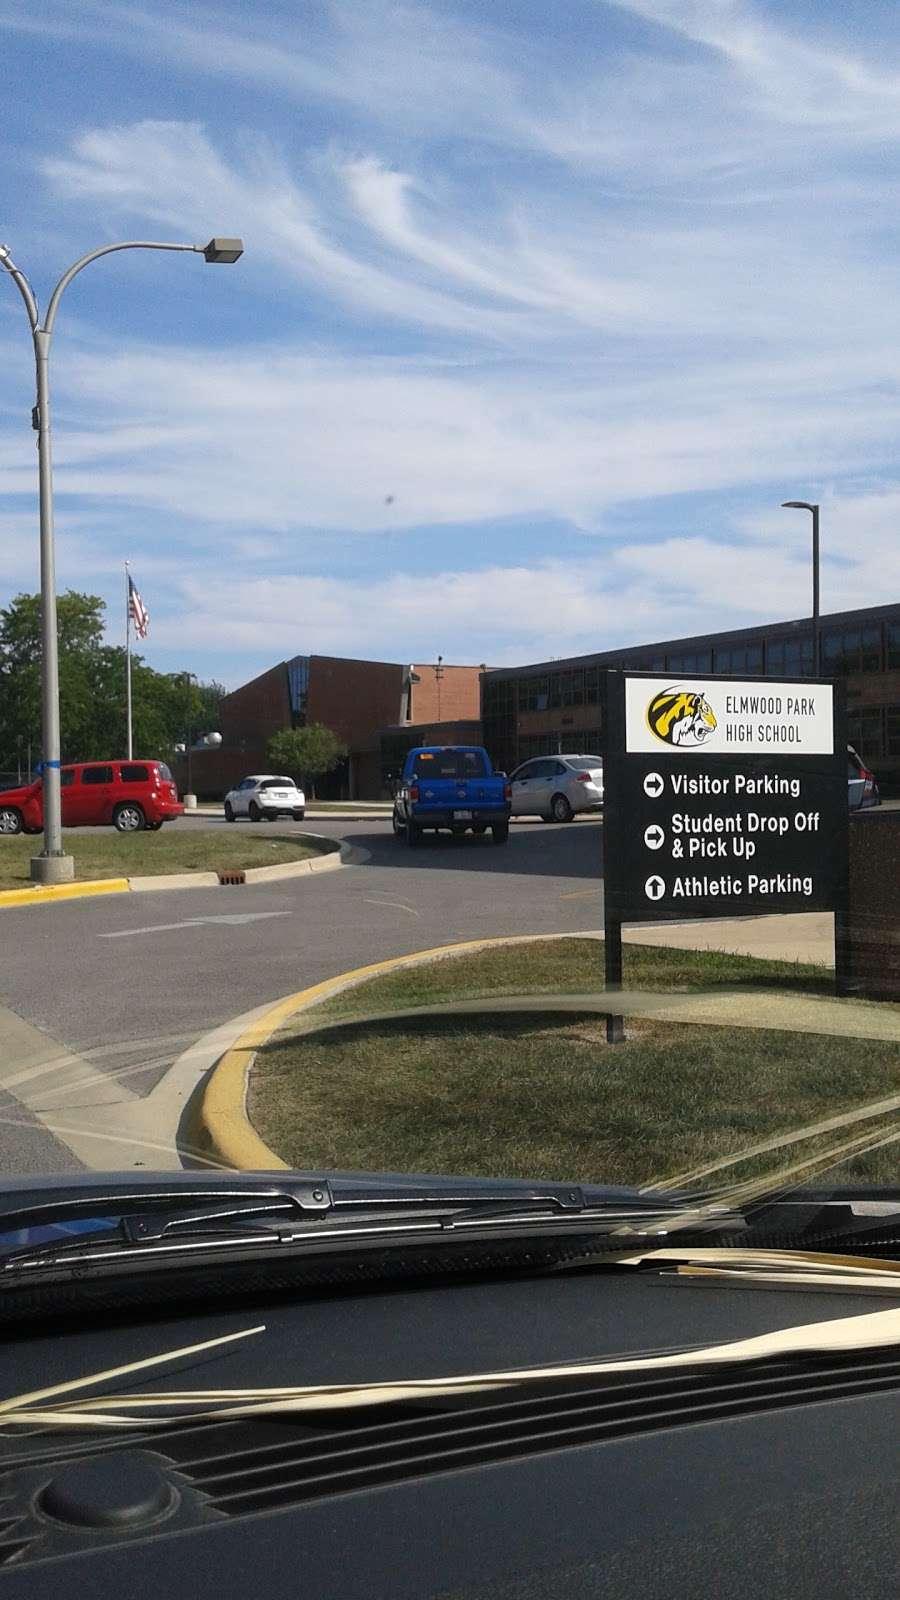 Elmwood Park High School - school  | Photo 6 of 6 | Address: 8201 W Fullerton Ave, Elmwood Park, IL 60707, USA | Phone: (708) 452-7272